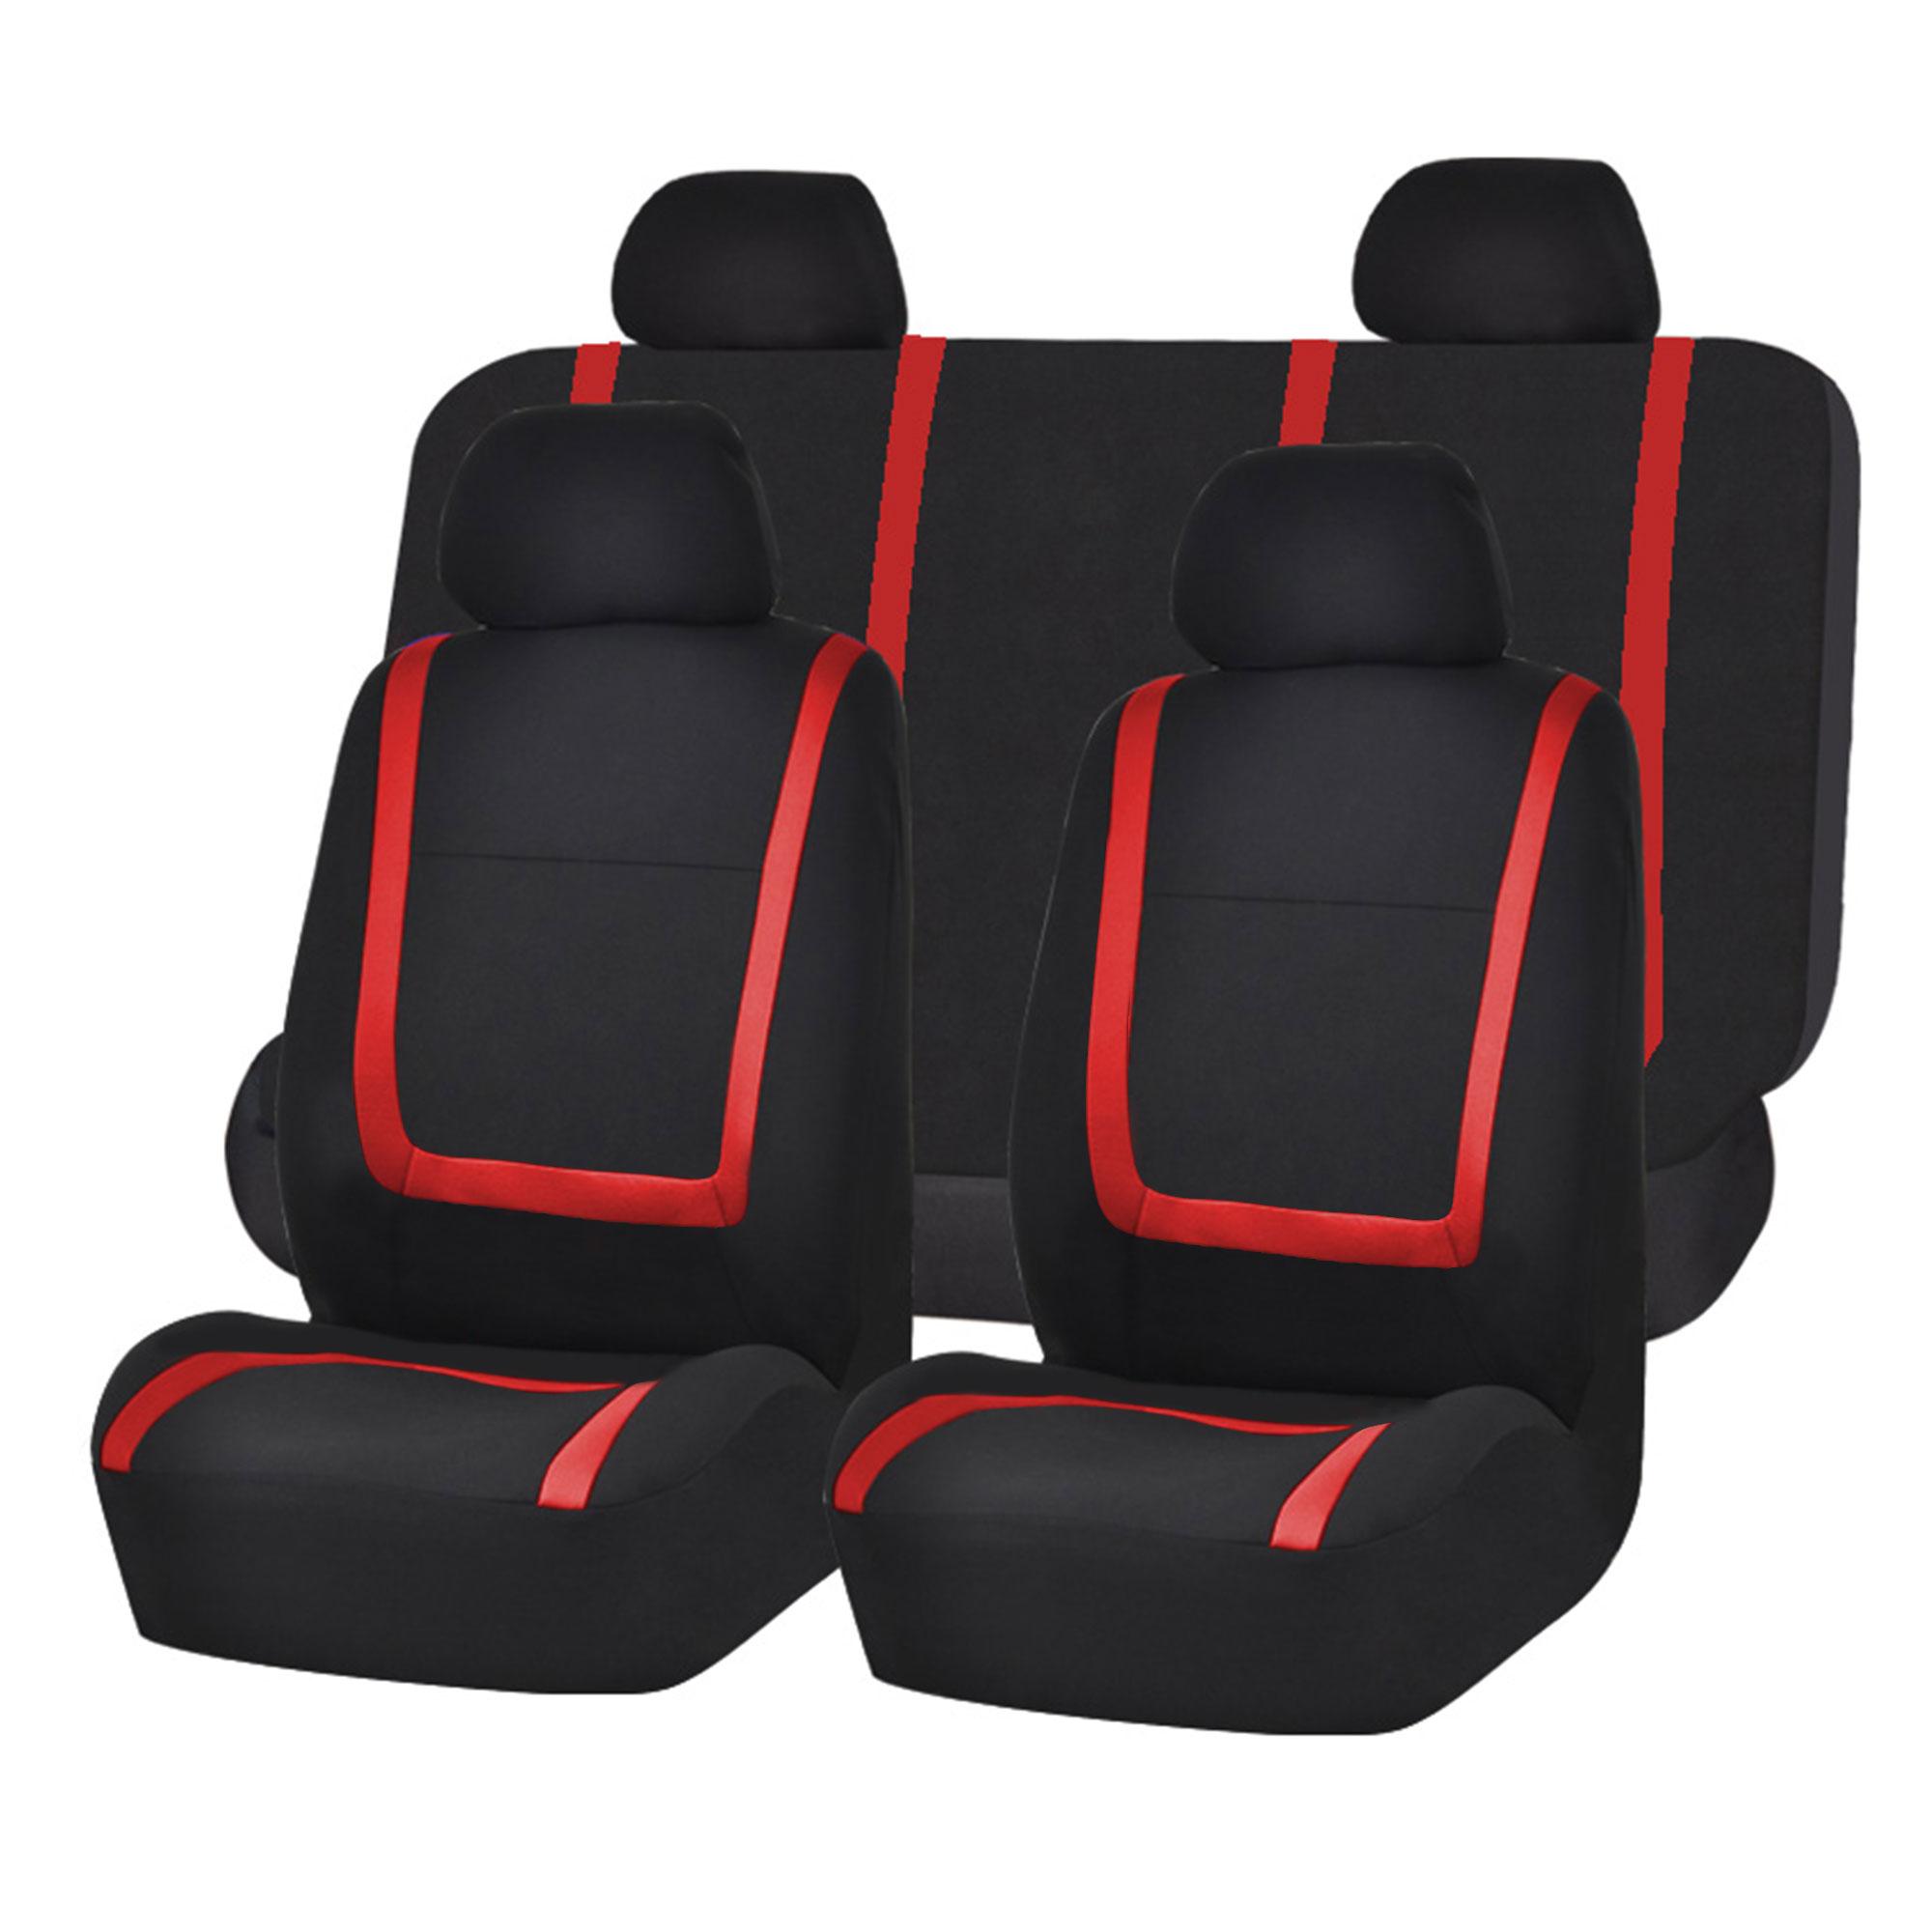 Universal Car Seat : Auto seat covers for car sedan truck van universal